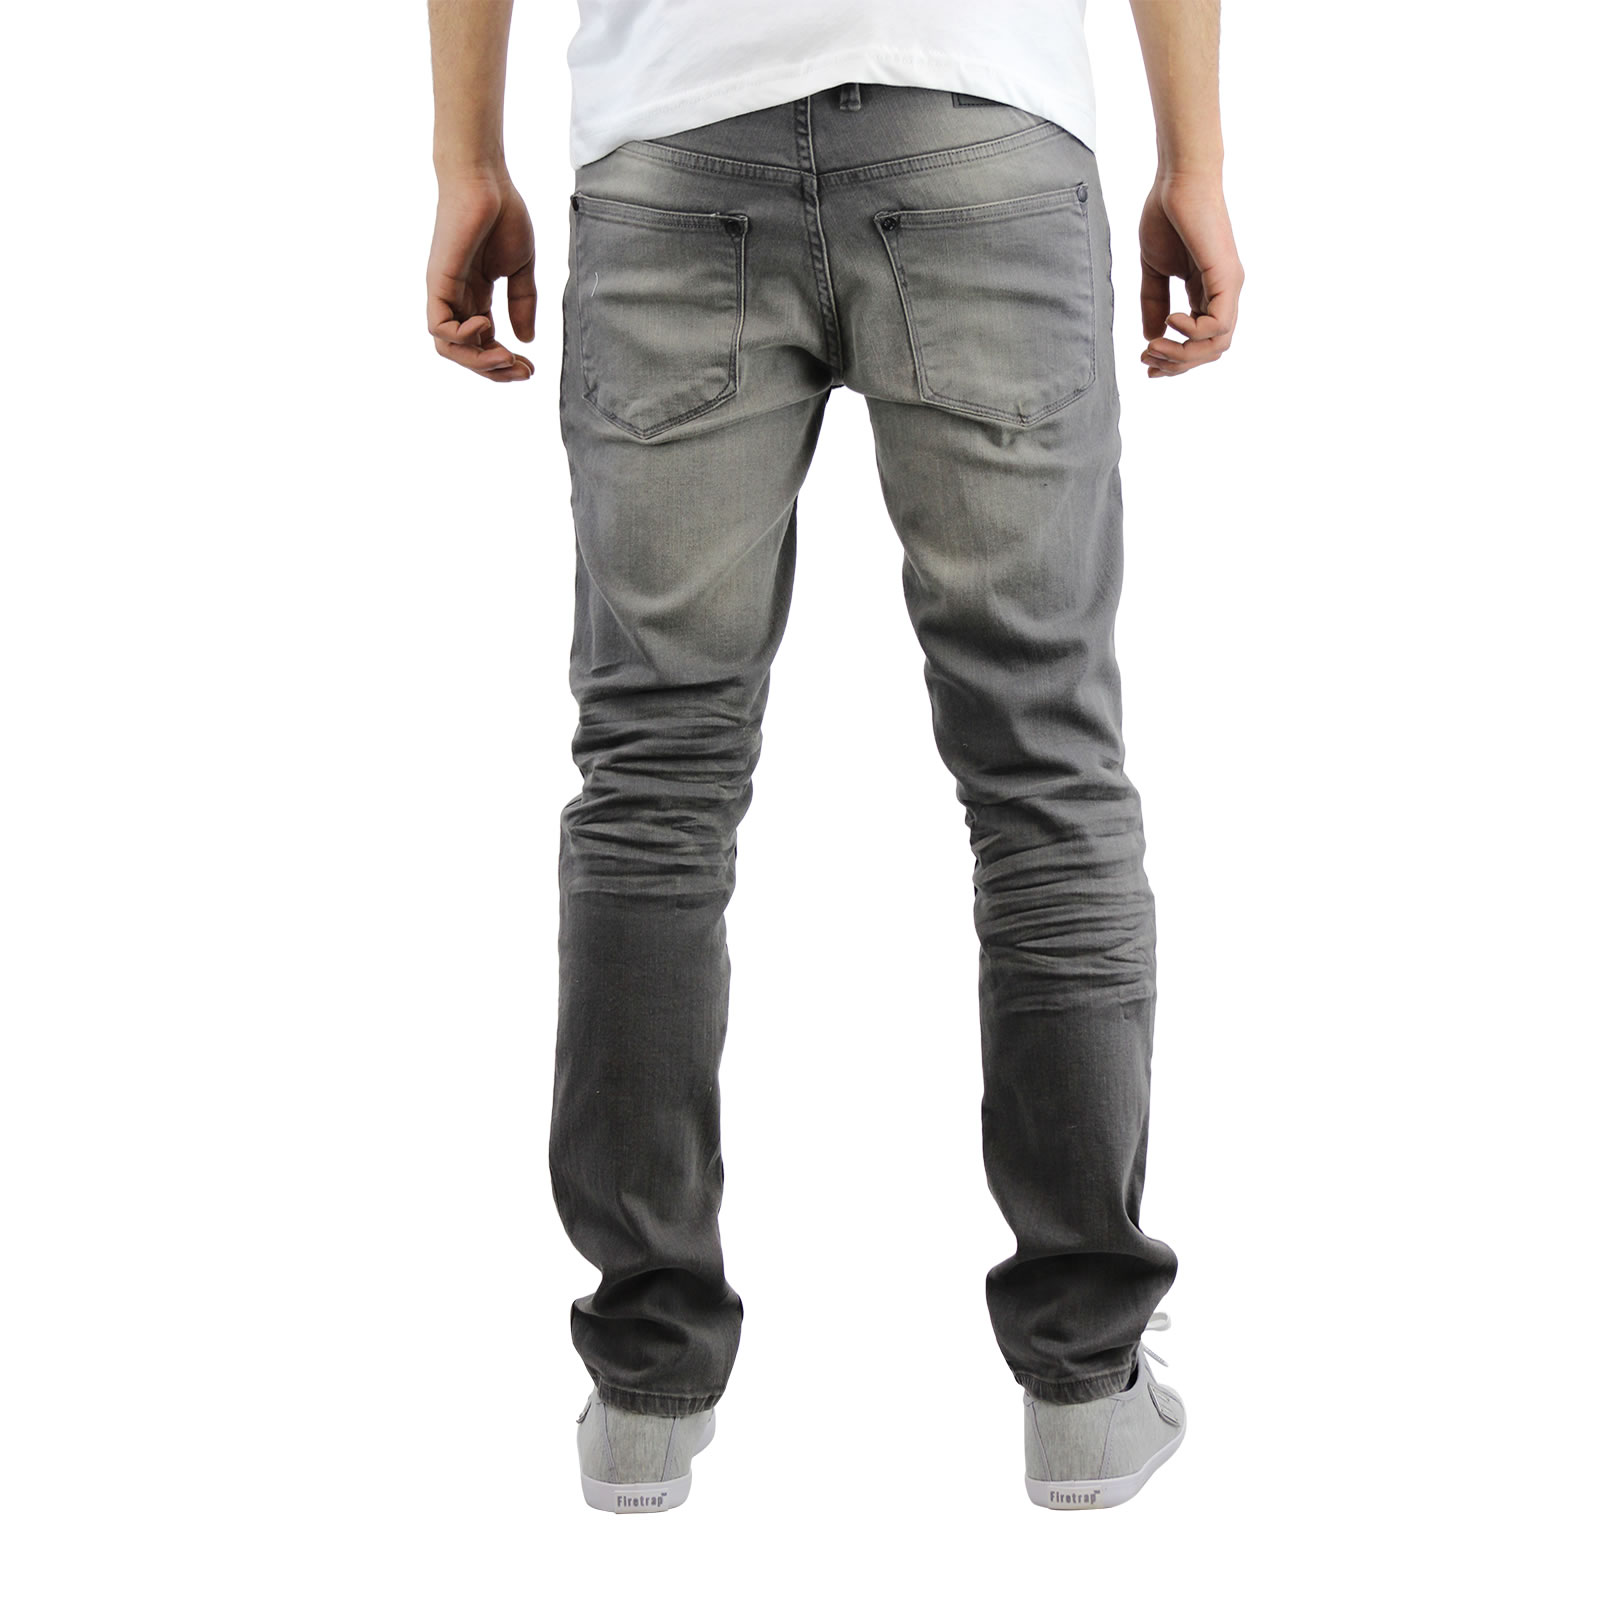 miniature 10 - Homme Crosshatch Jaco Slim Jeans stretch pantalon denim effet vieilli